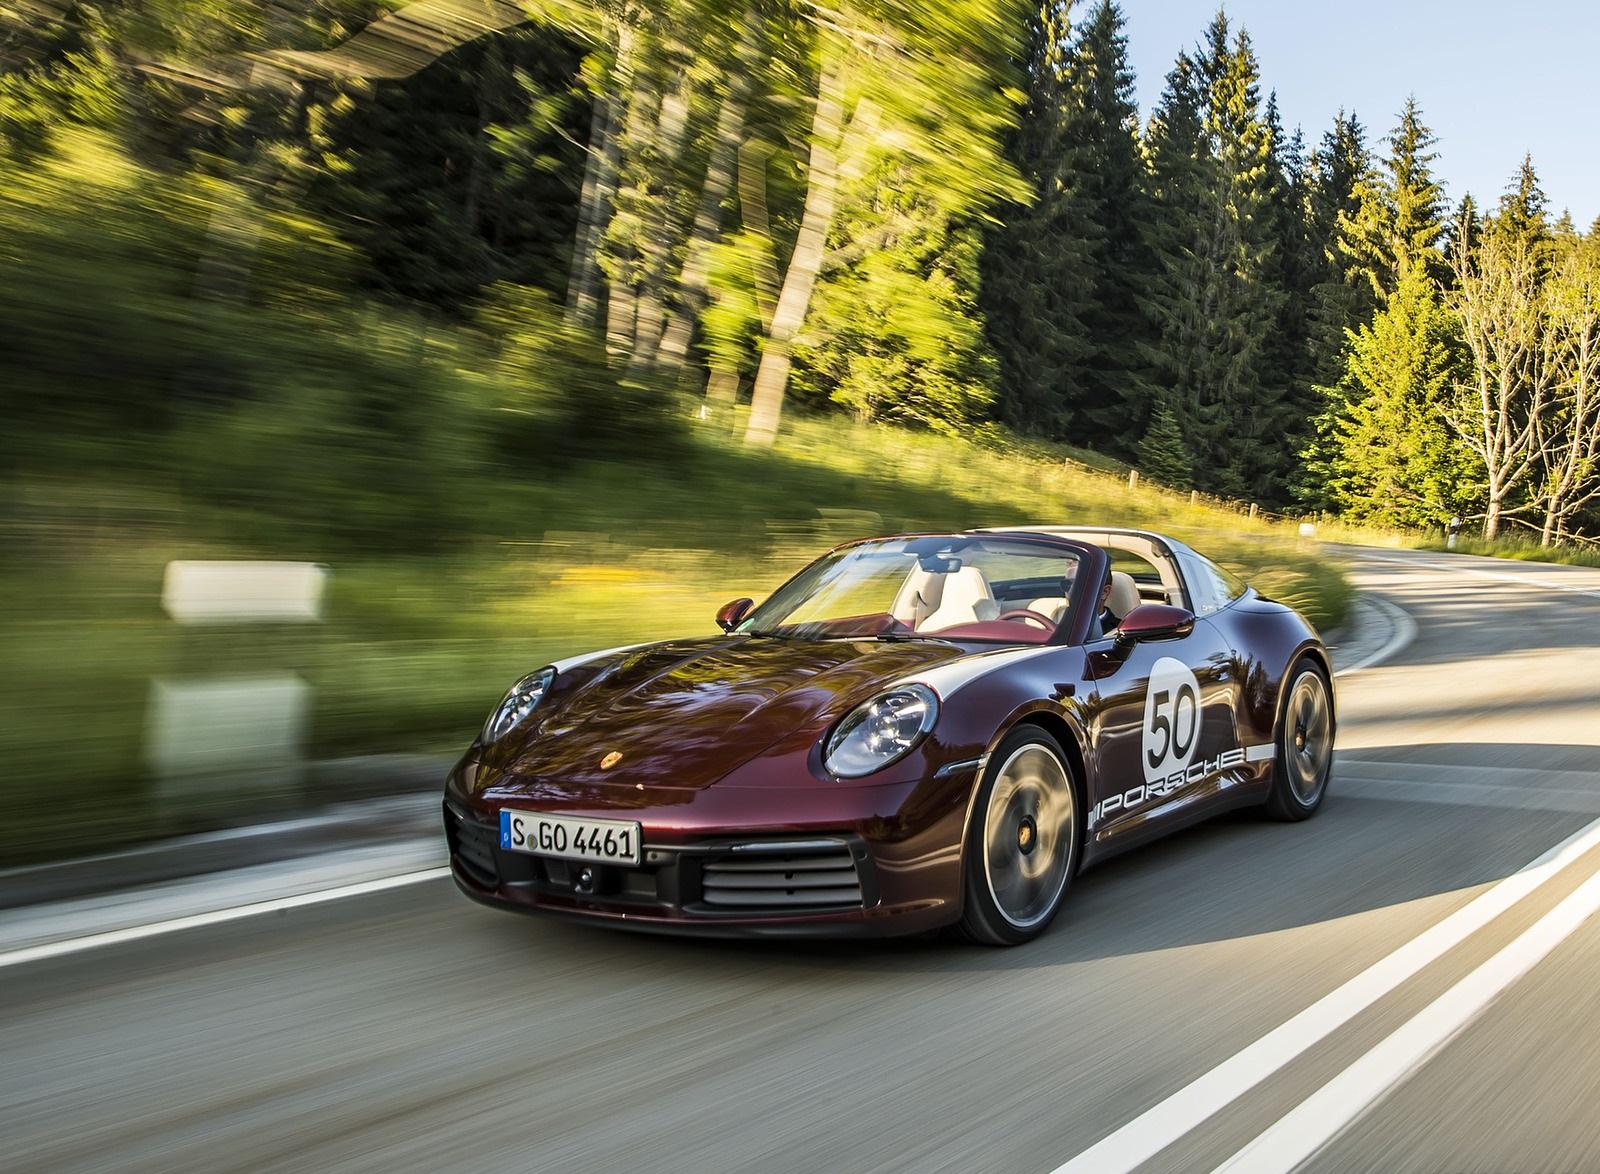 2021 Porsche 911 Targa 4S Heritage Design Edition (Color: Cherry Metallic) Front Three-Quarter Wallpapers (7)